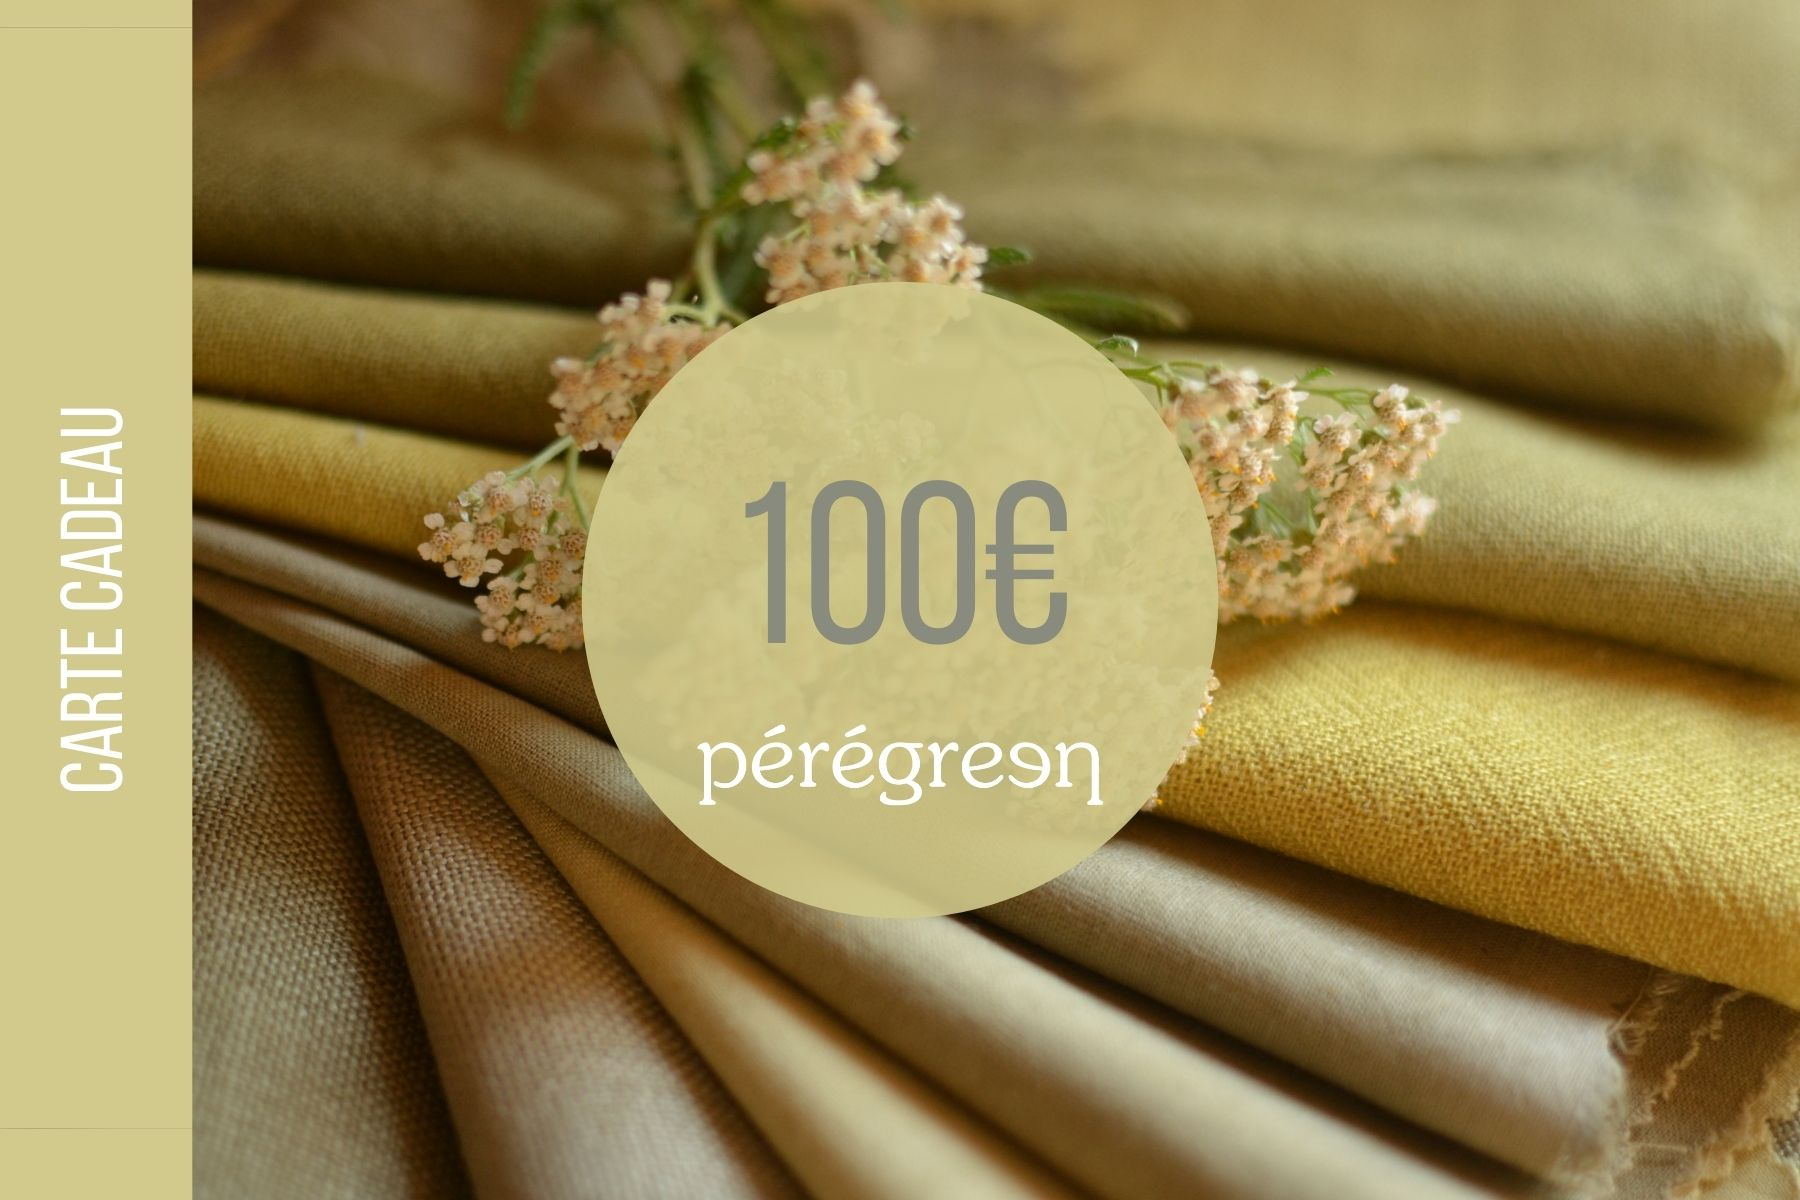 Carte cadeau Pérégreen